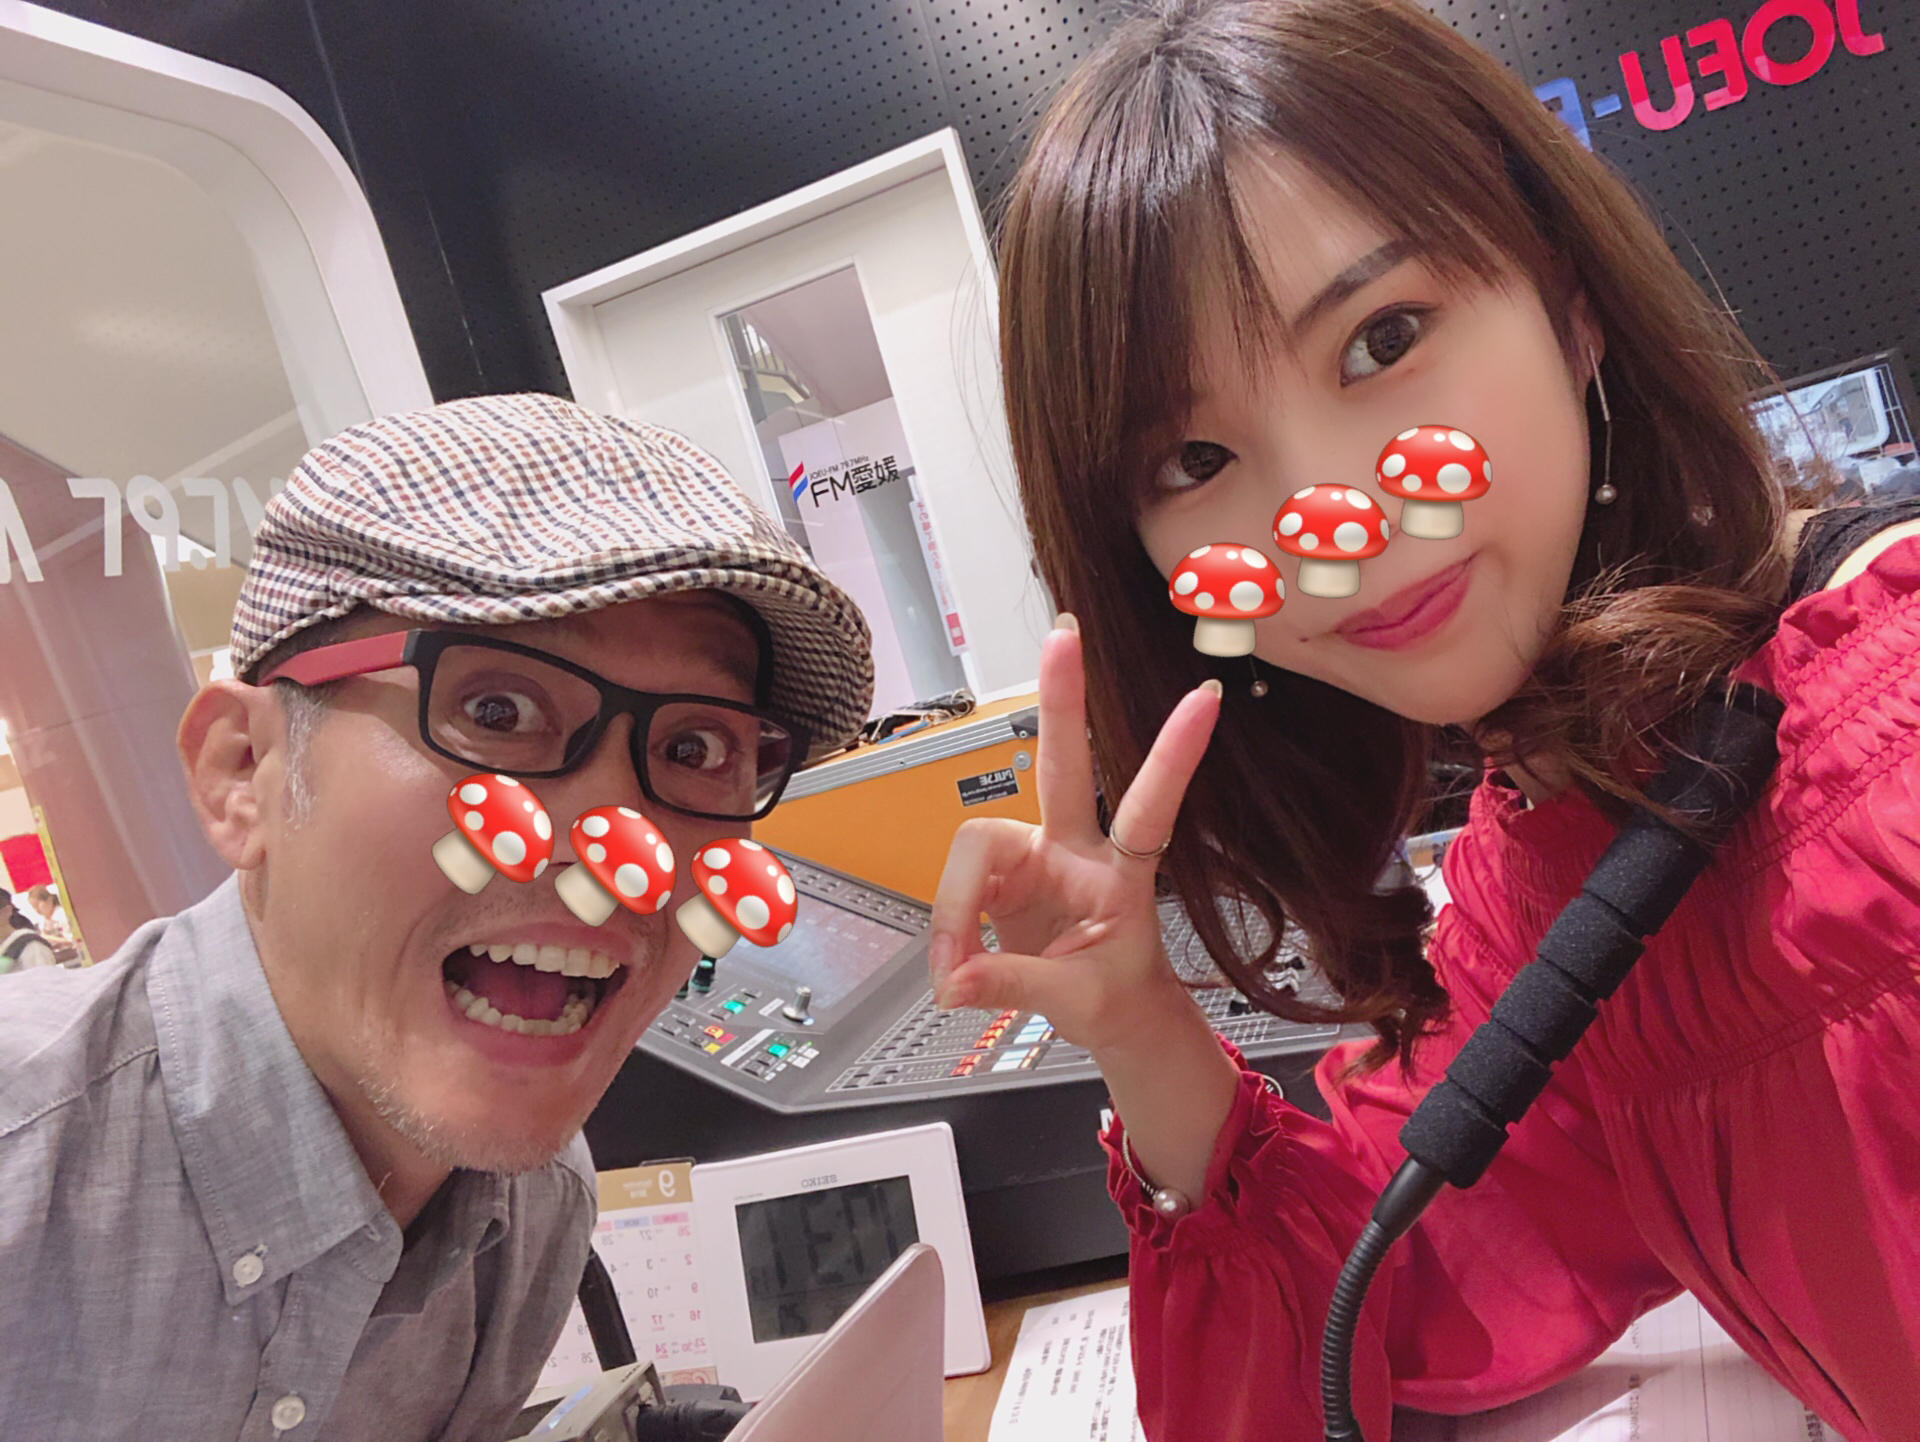 https://emifull.jp/emifulls_blog/11th/uploads/da3d62fd1a6831e7fed187af2589347dbe298174.jpeg